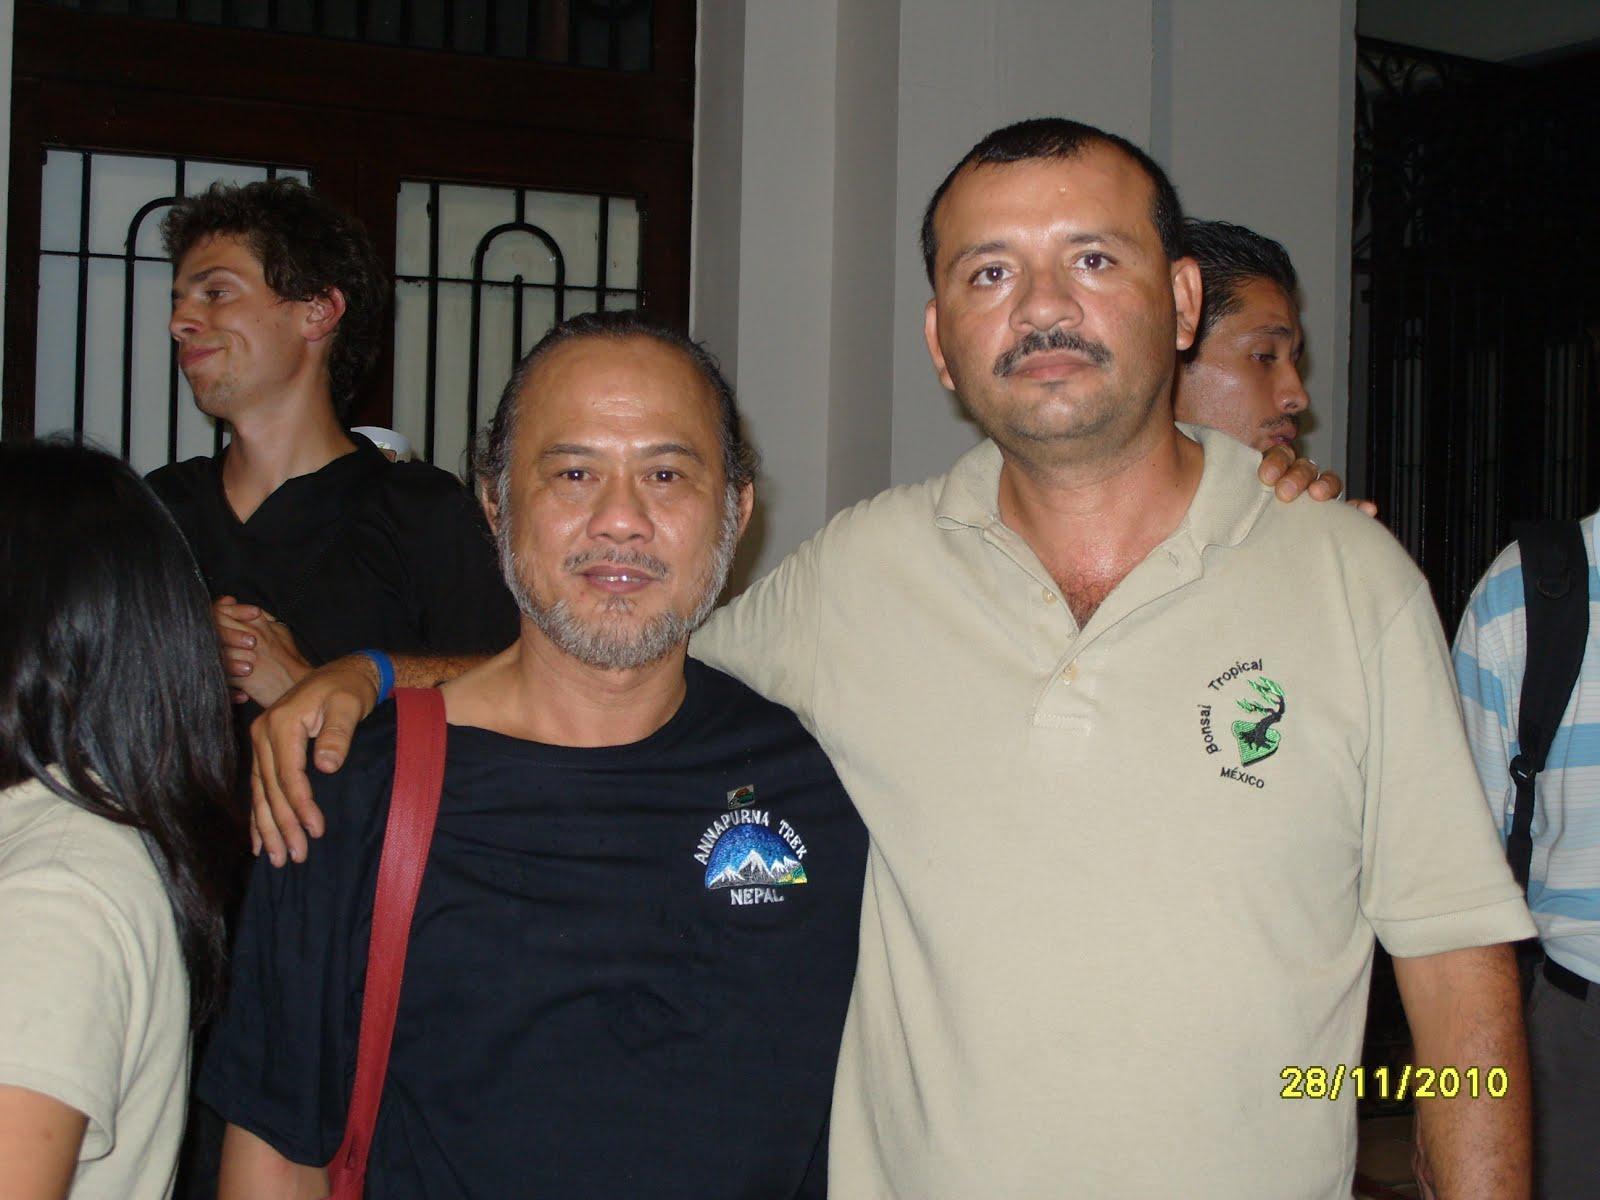 Con el Maestro Robert Stevens felab 2010